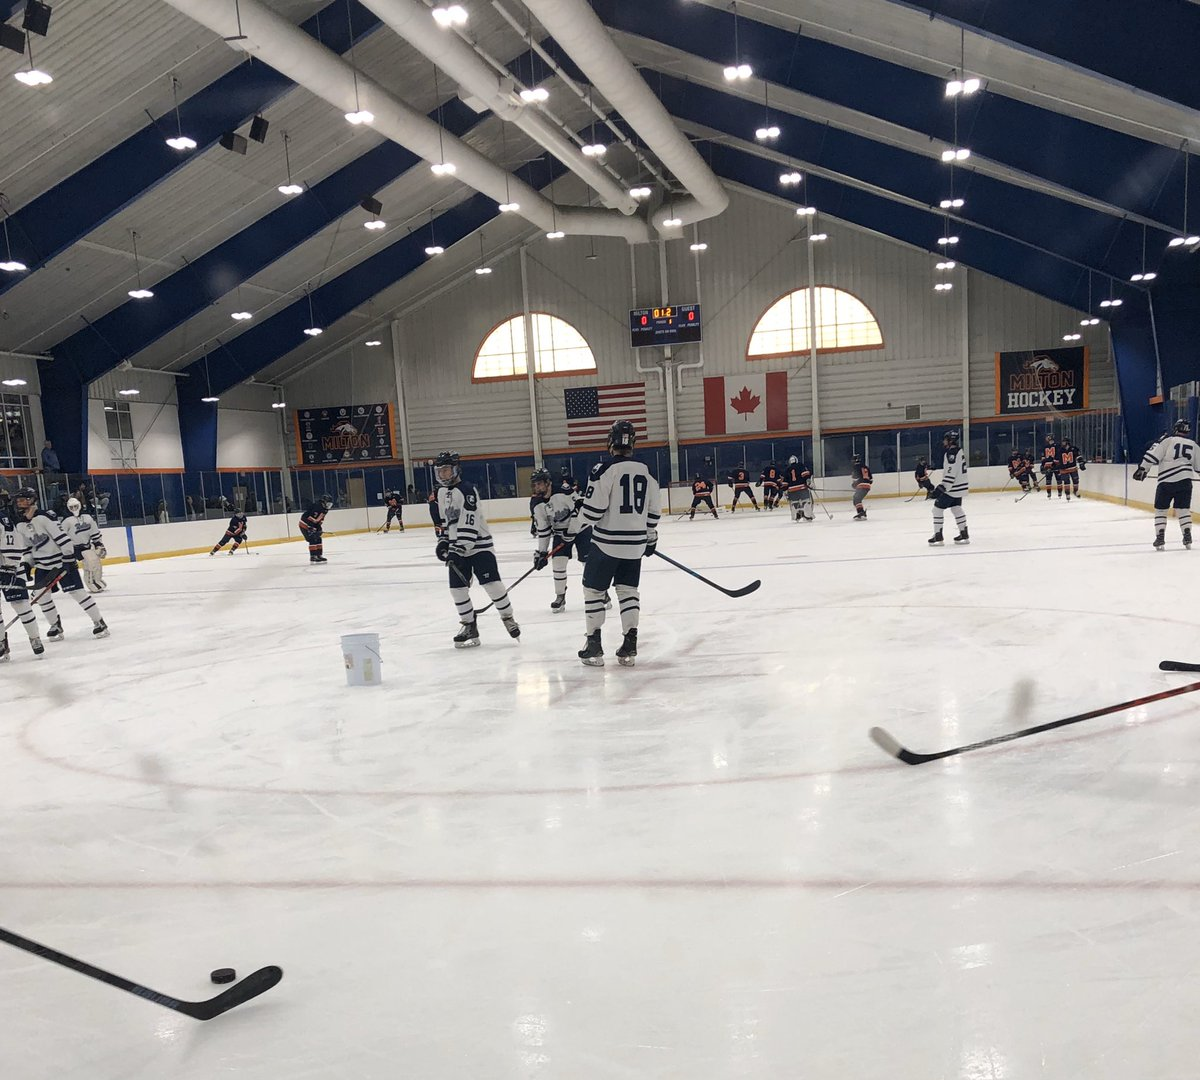 🏒 Nobles vs. Milton @nobleshockey @MiltonAcad_puck #NEPrepped